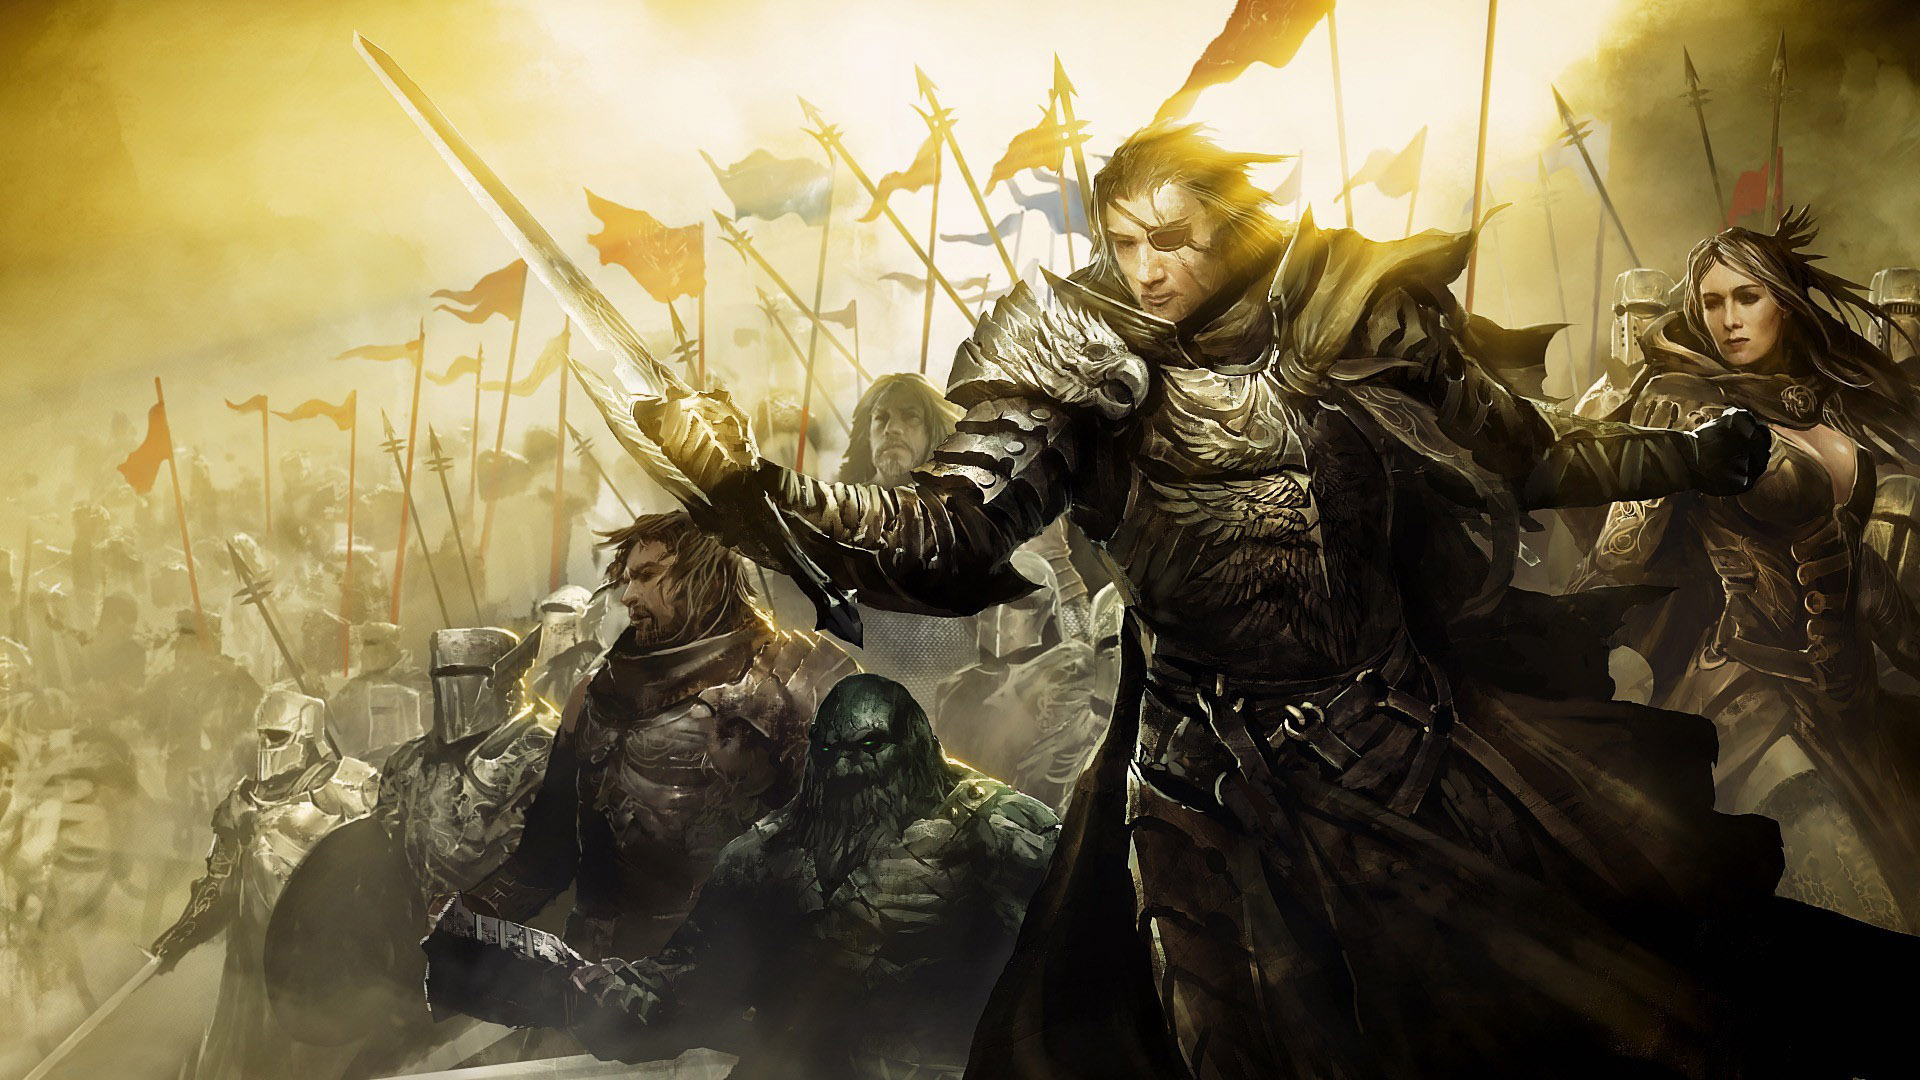 Guild Wars 2 Video Games Charr Wallpapers Hd Desktop: Guild Wars 2 Wallpaper Hd